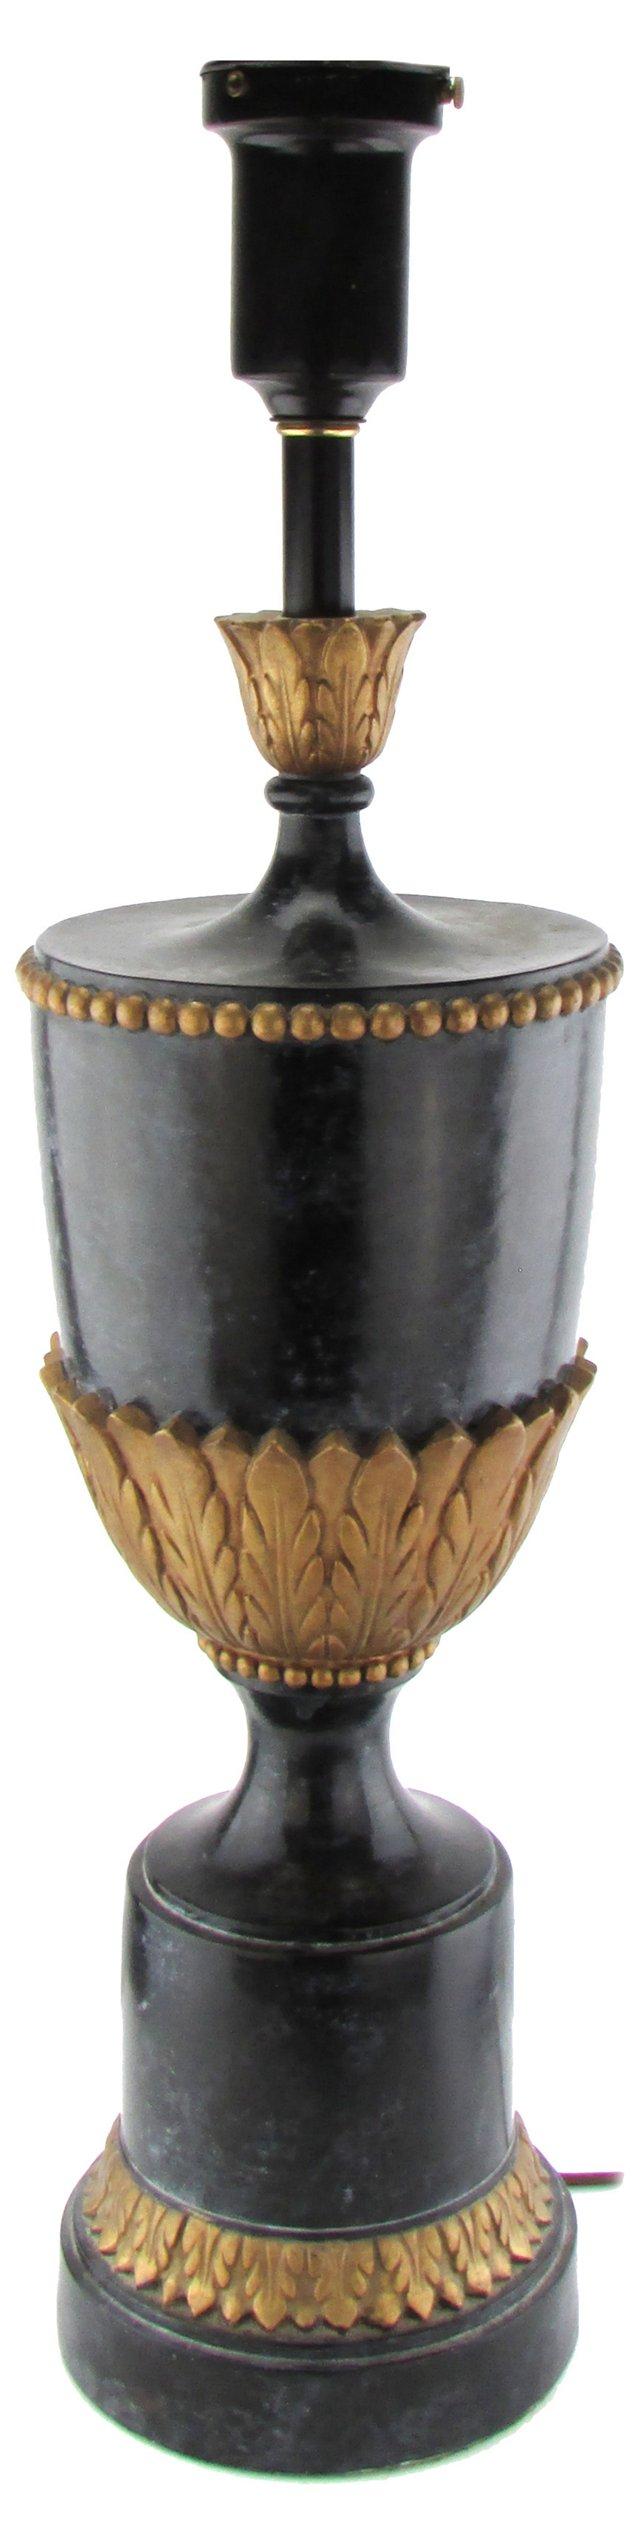 Urn-Shaped Lamp